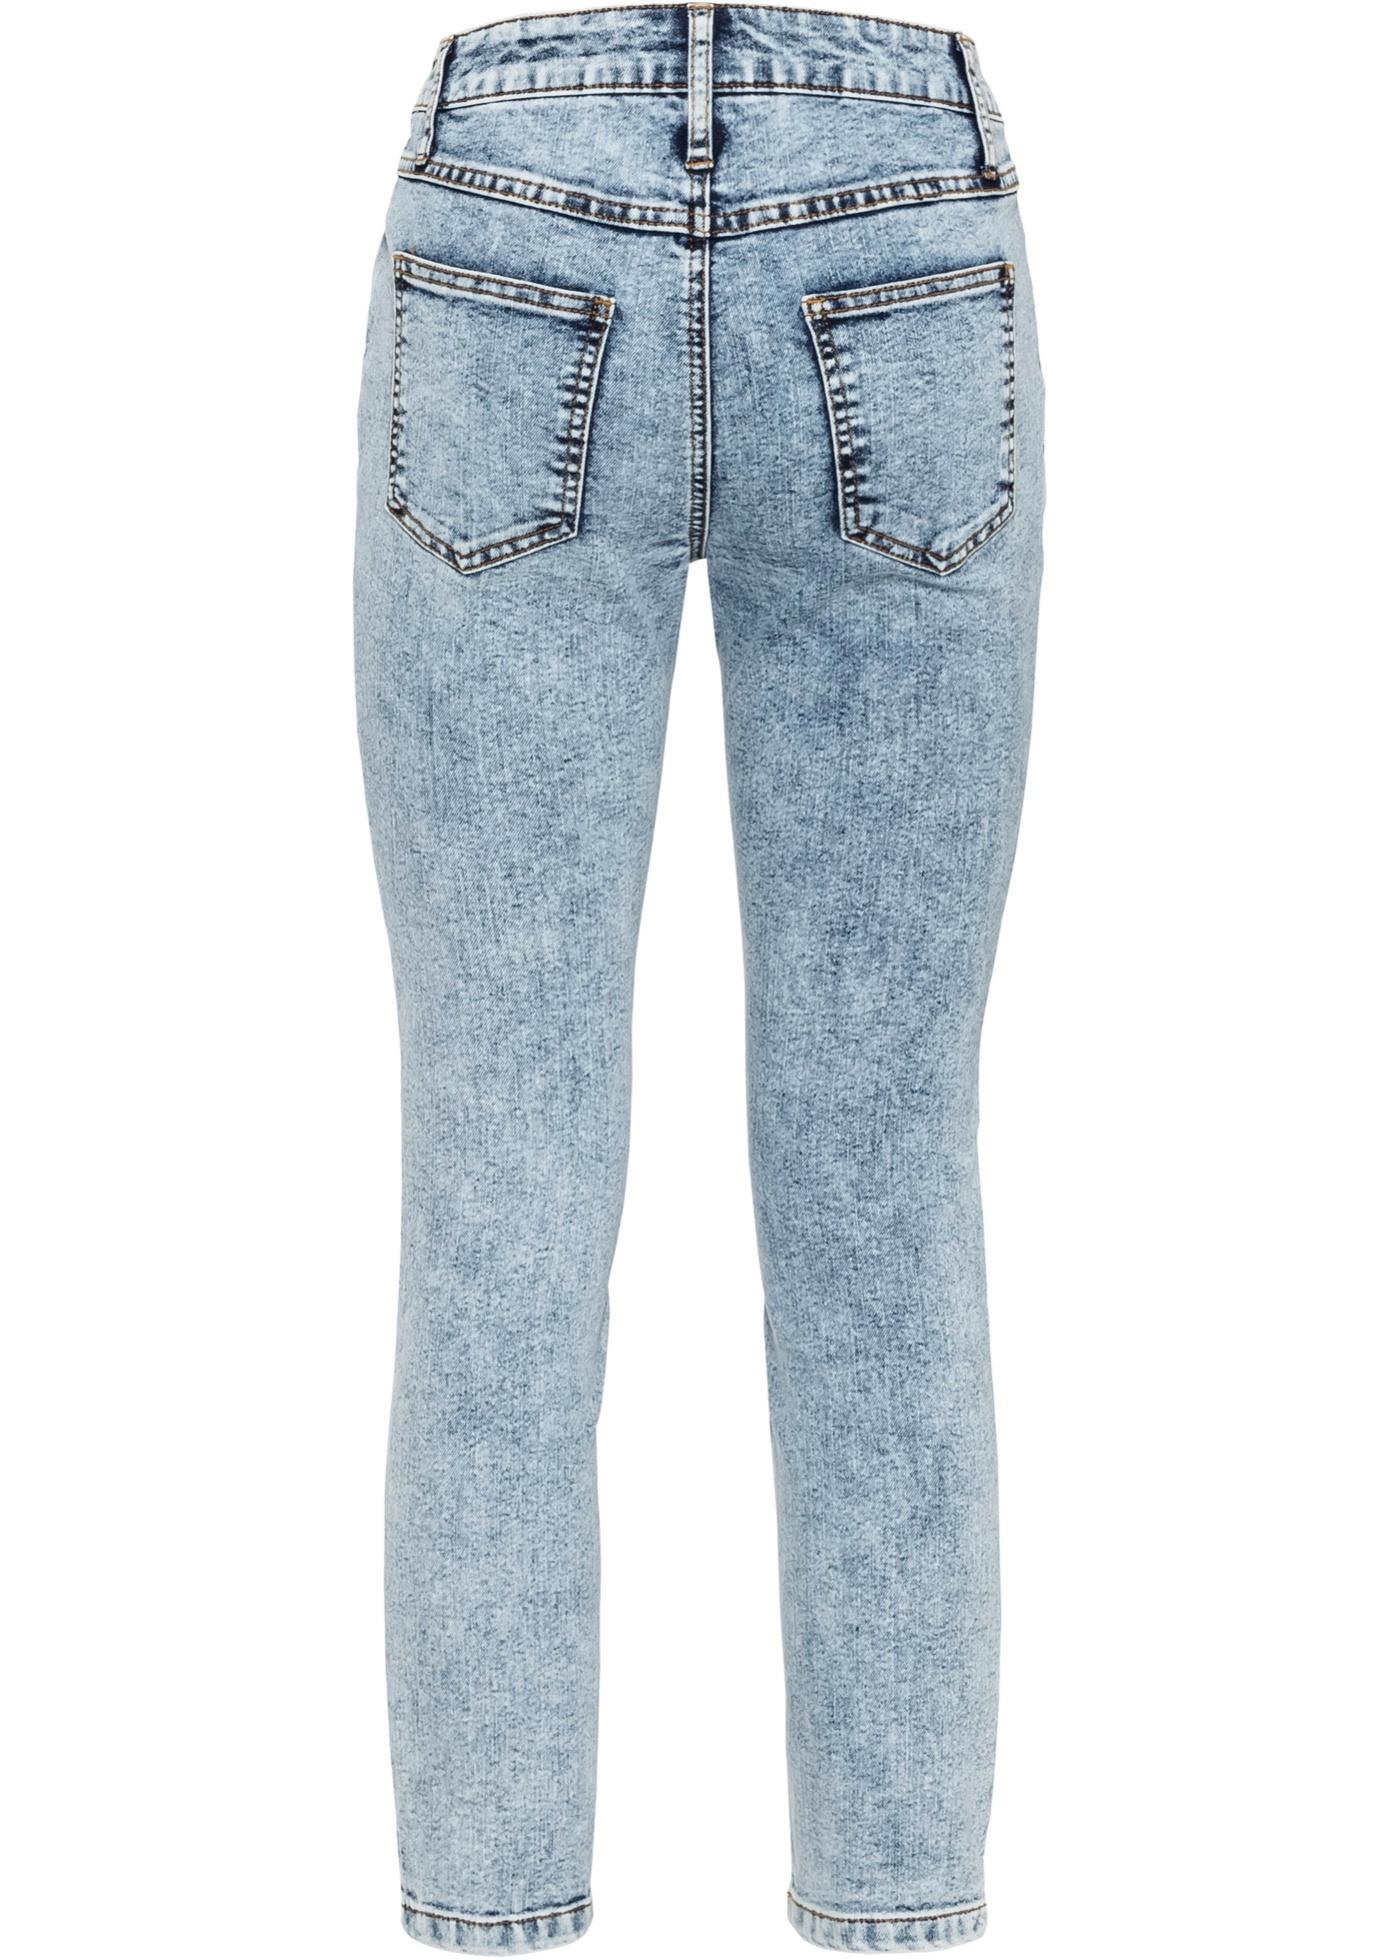 Bonprix 7/8 jeans